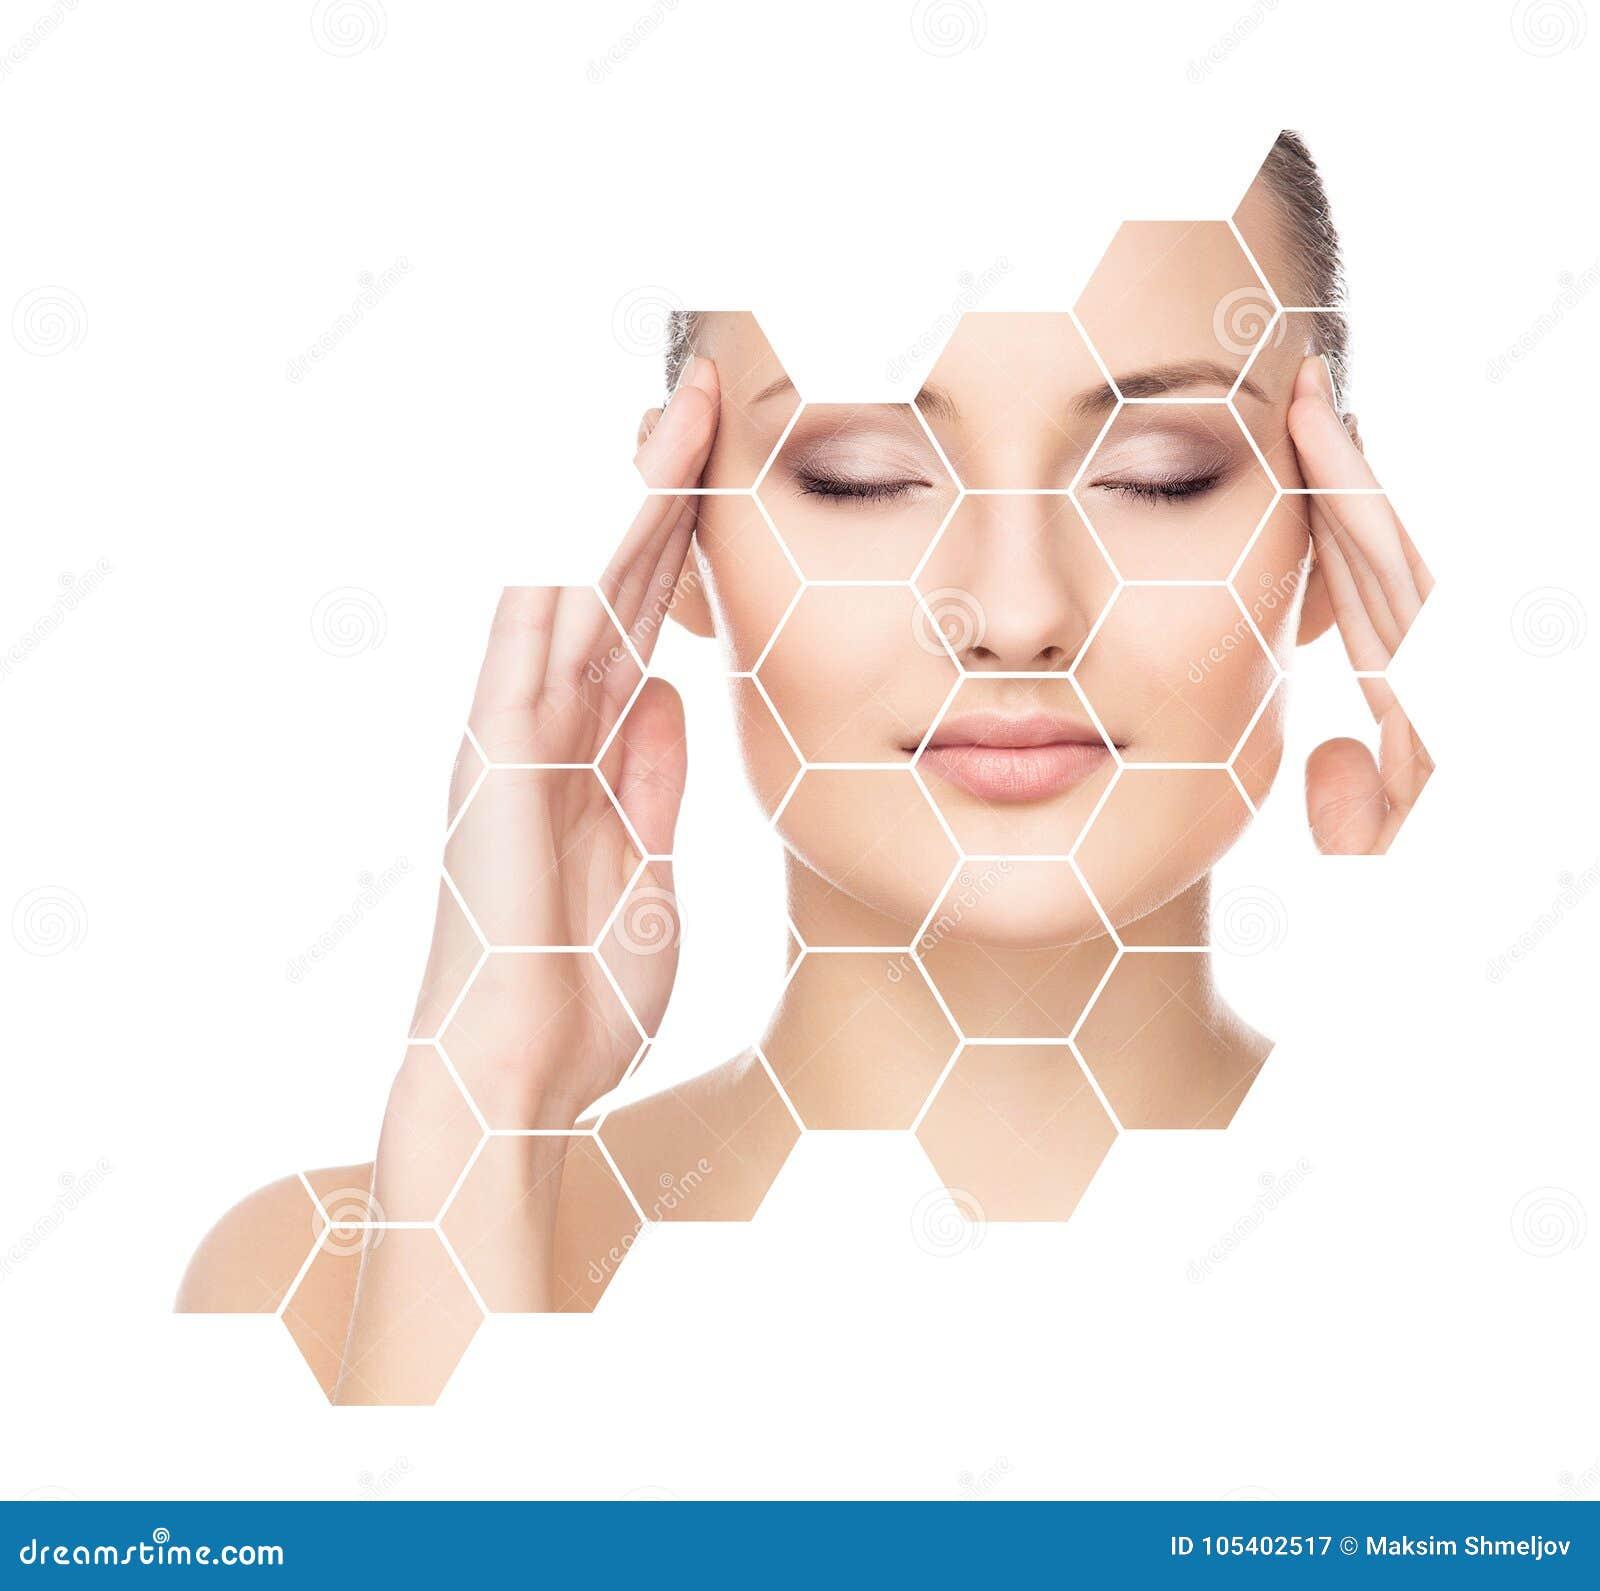 Download Όμορφο πρόσωπο του νέου και υγιούς κοριτσιού Πλαστική χειρουργική, φροντίδα δέρματος, καλλυντικά και έννοια ανύψωσης προσώπου Στοκ Εικόνα - εικόνα από αιθέρα, χροιά: 105402517